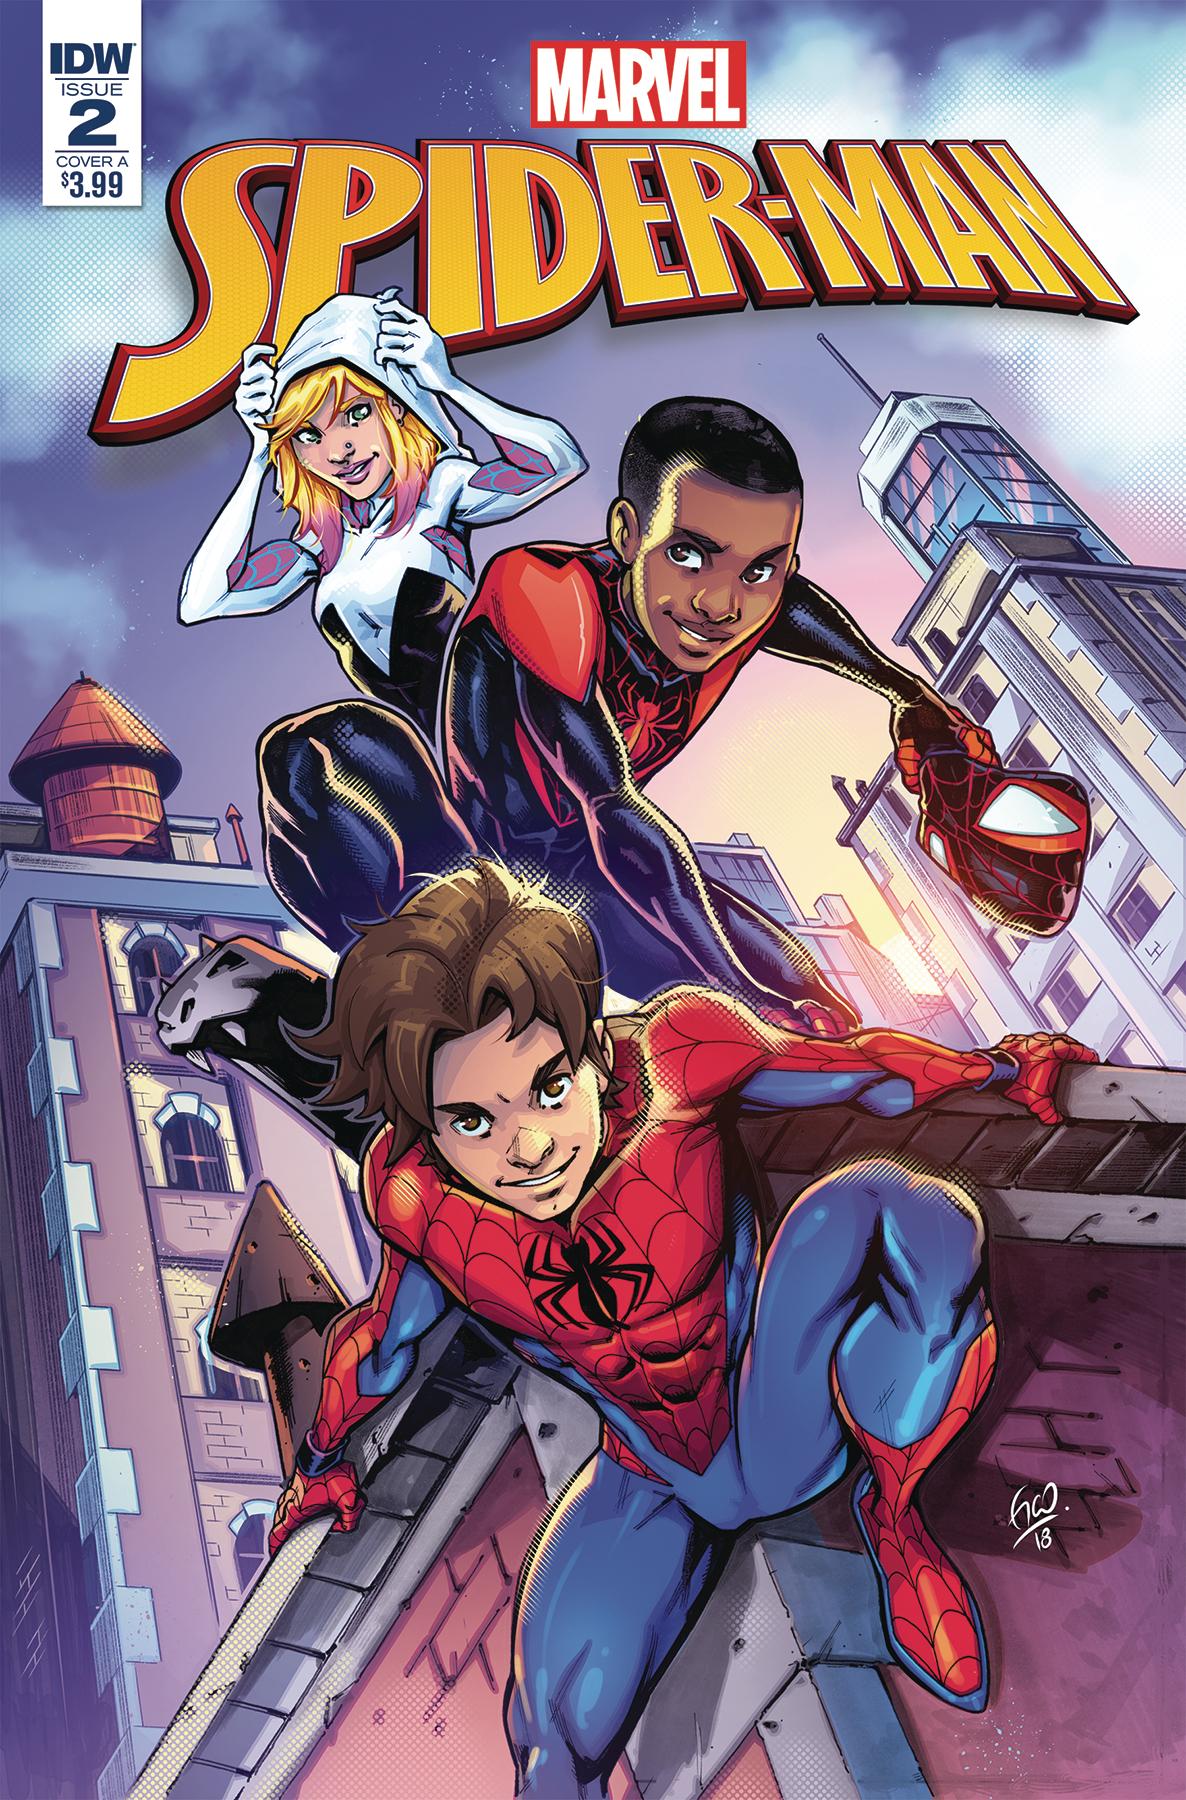 Marvel Action: Spider-Man Vol 1 2